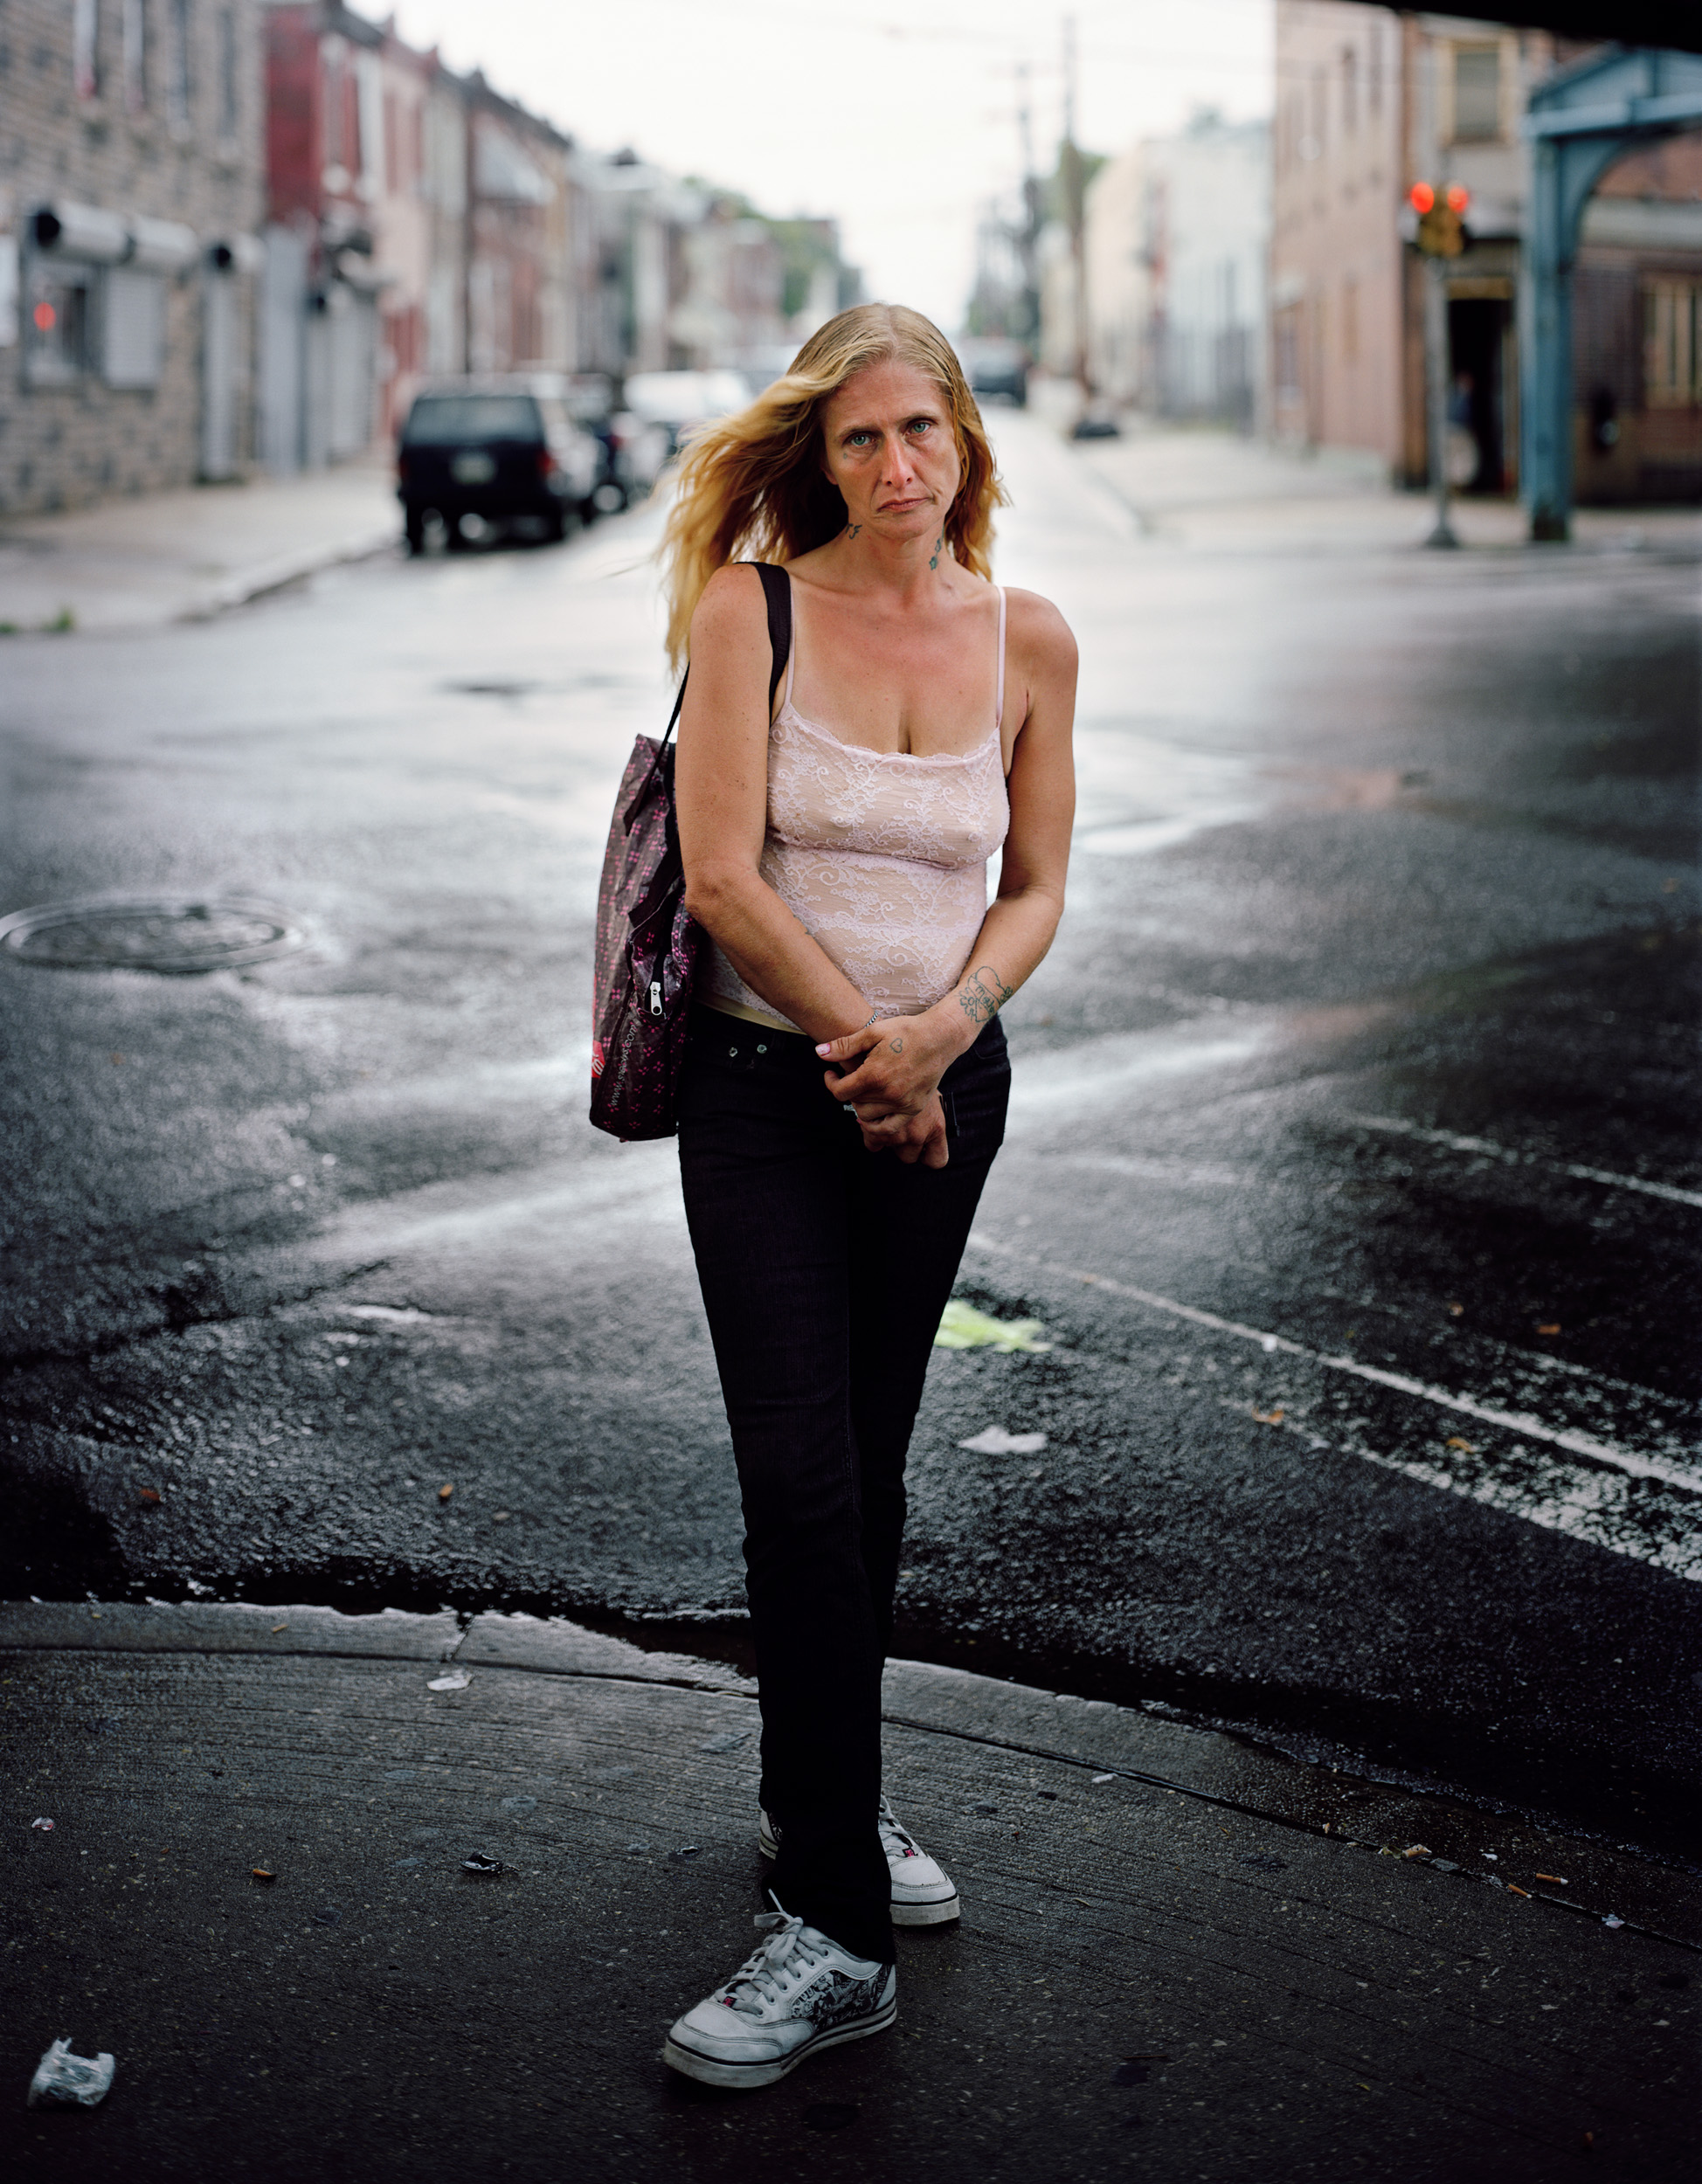 Carol, North Philadelphia, 2010